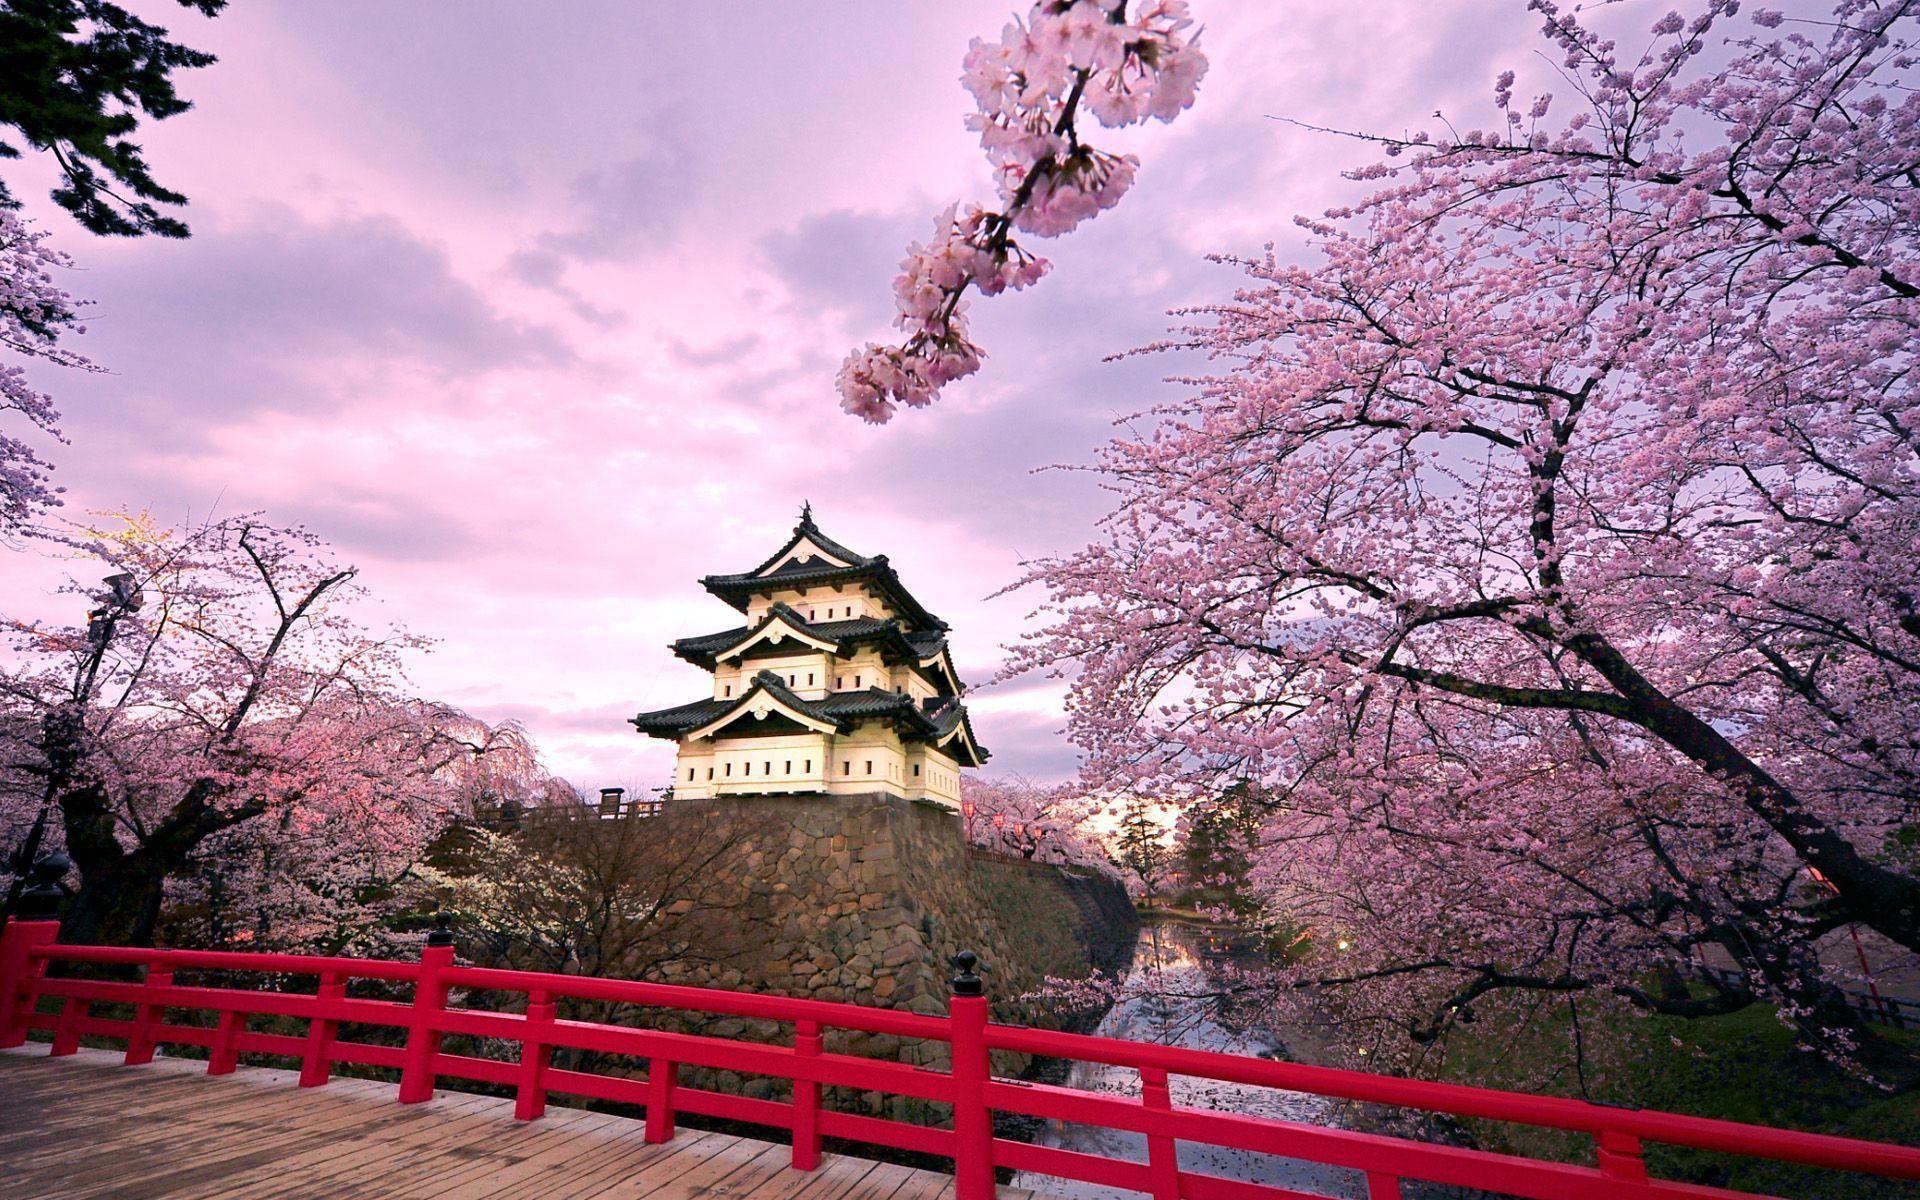 Japan Morning Wallpapers   Top Japan Morning Backgrounds 1920x1200